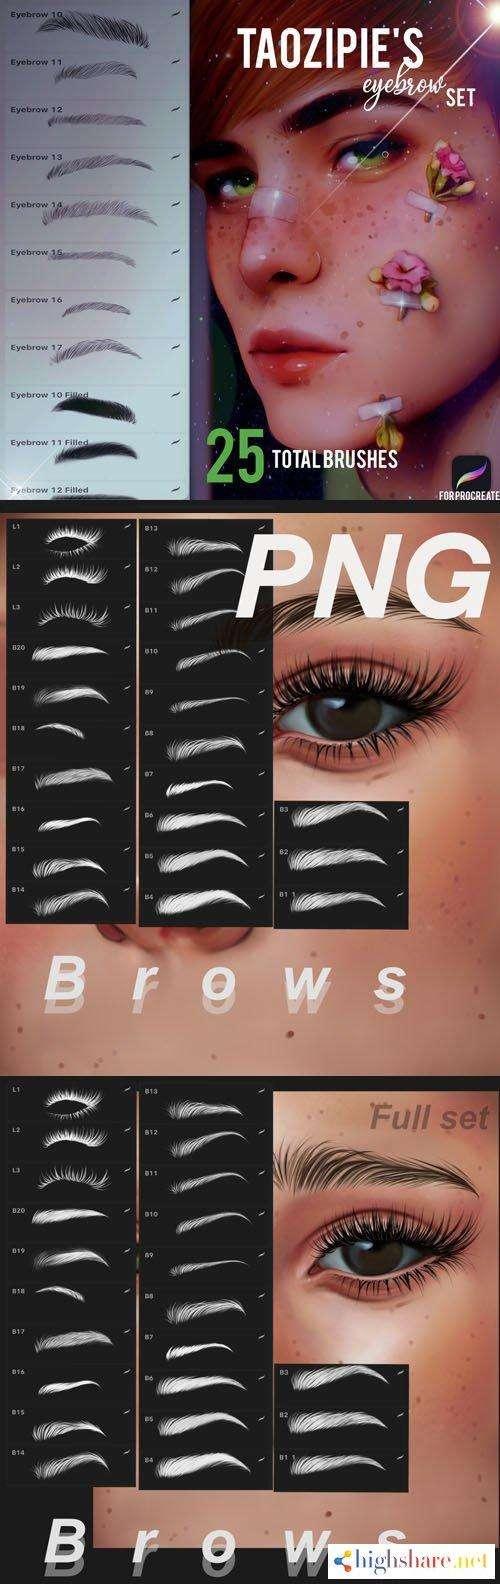 48 eyebrow procreate brush set pngs 5f473572838c3 - 48 Eyebrow Procreate Brush Set + PNGs